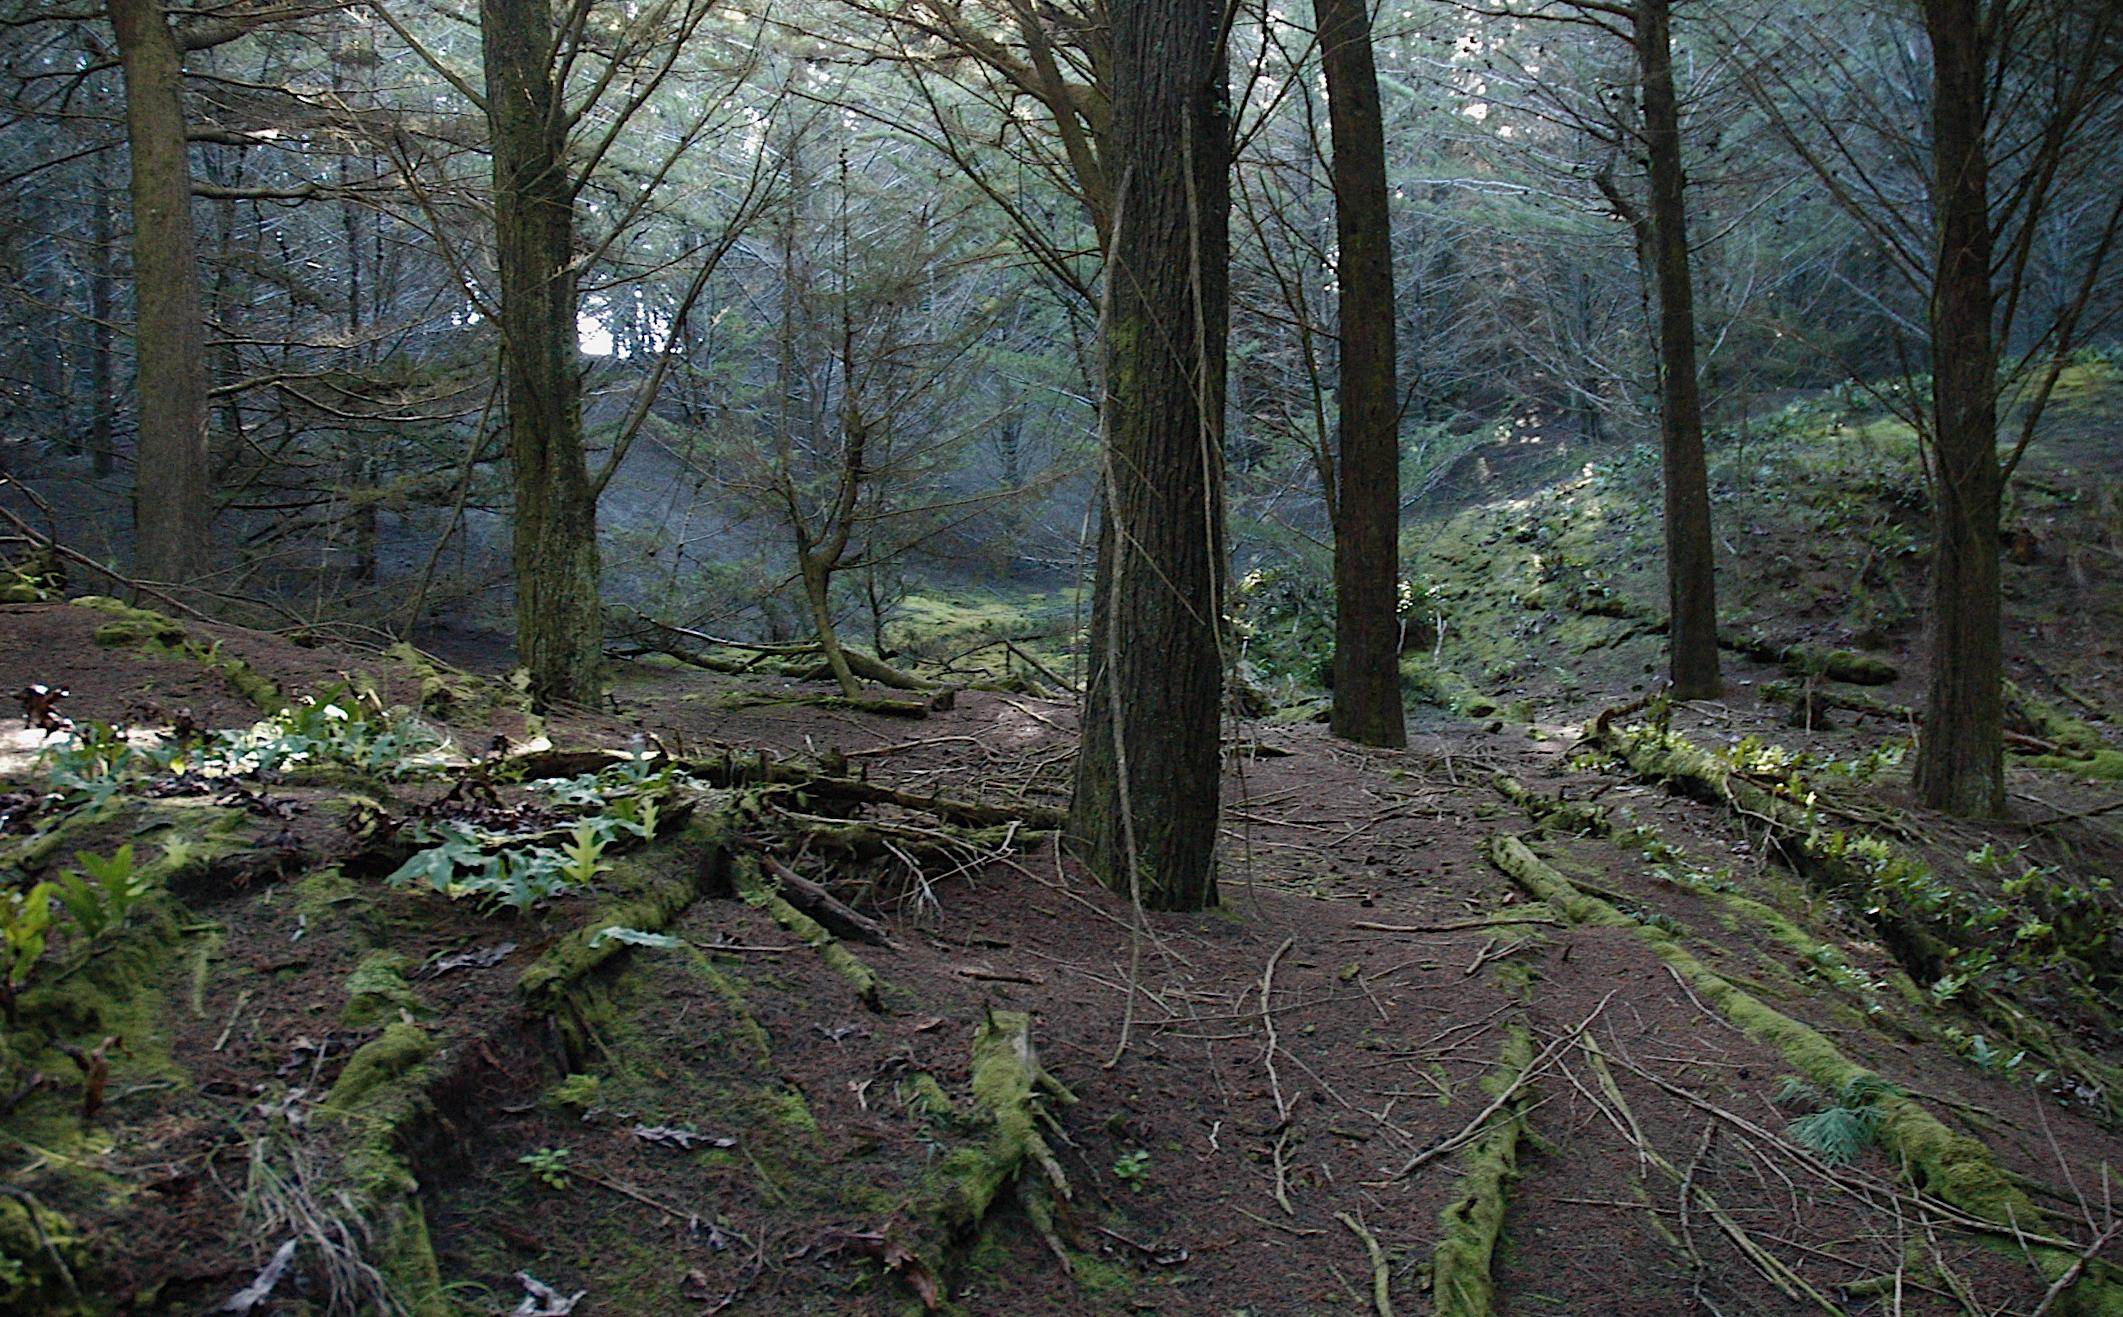 Waitarere forest